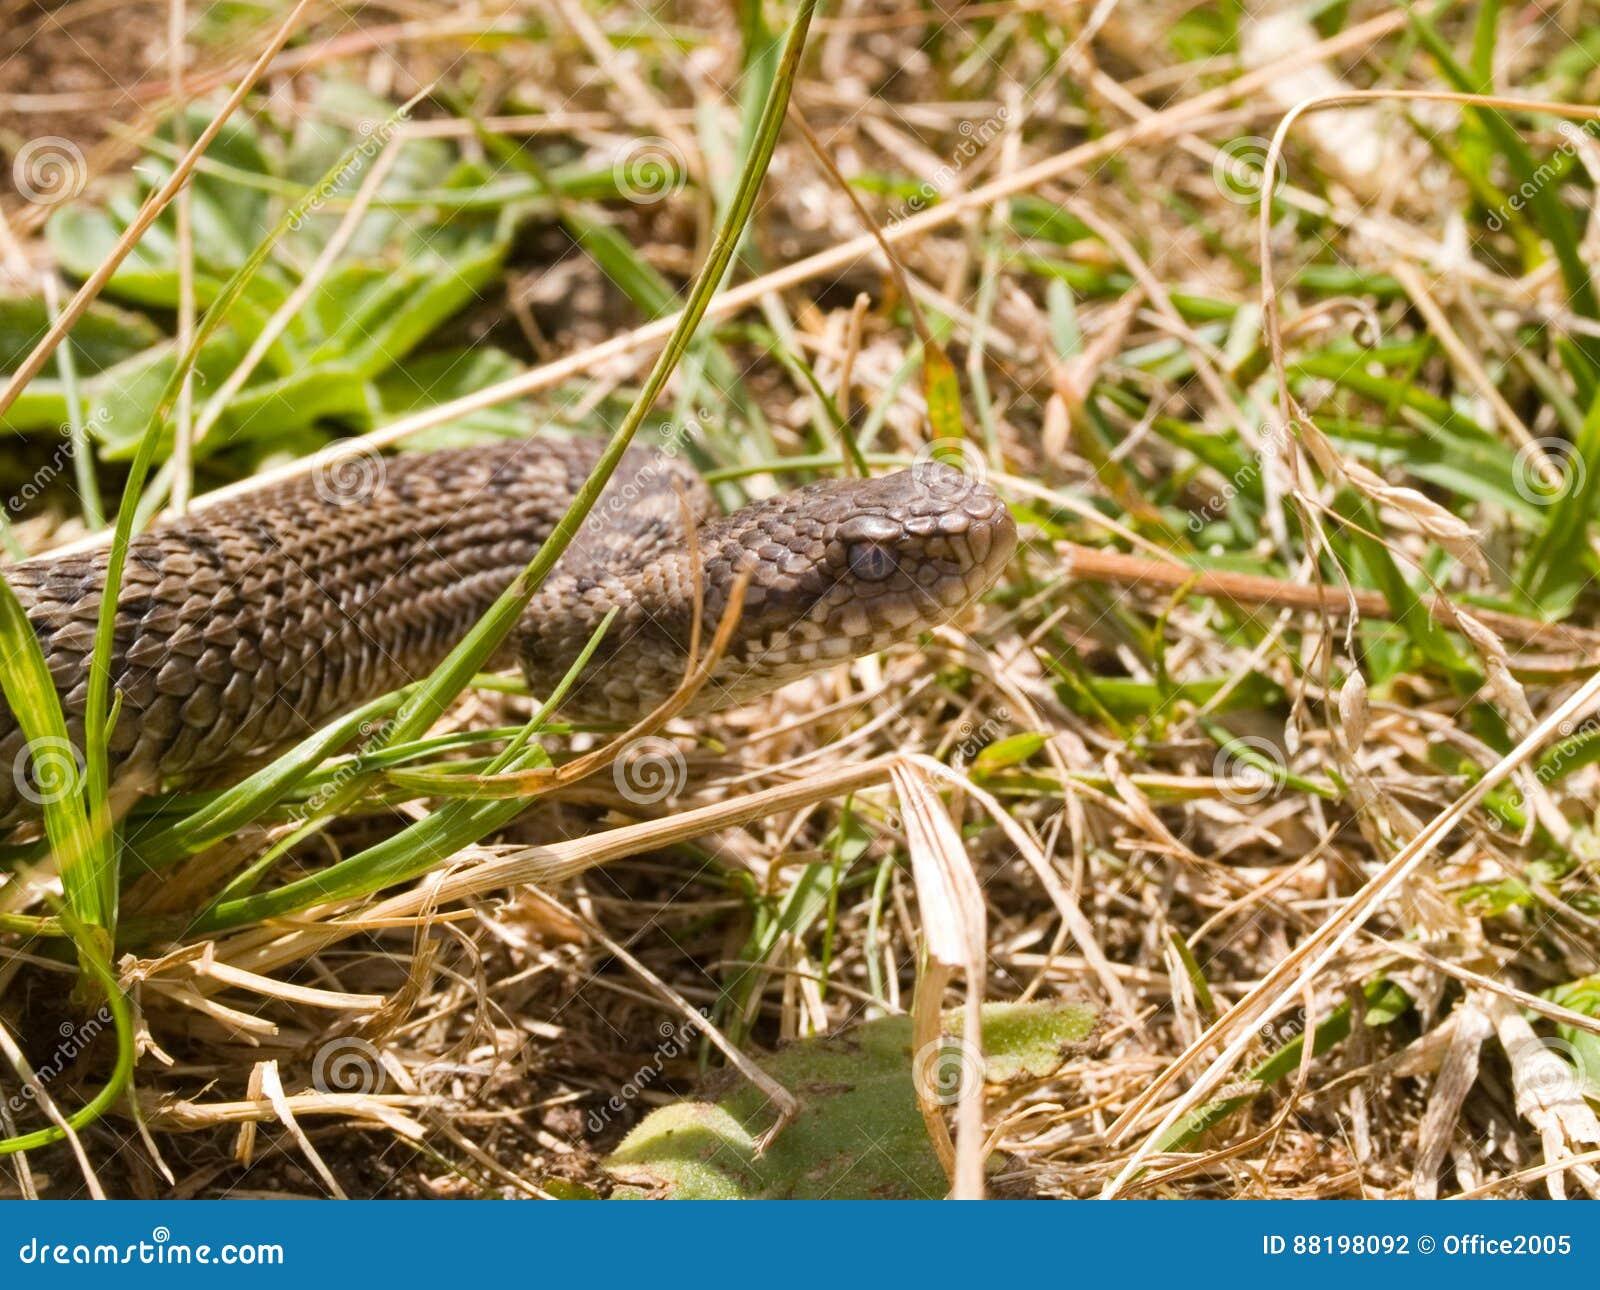 Vipera ursinii macrops stock photo  Image of snakes, meadow